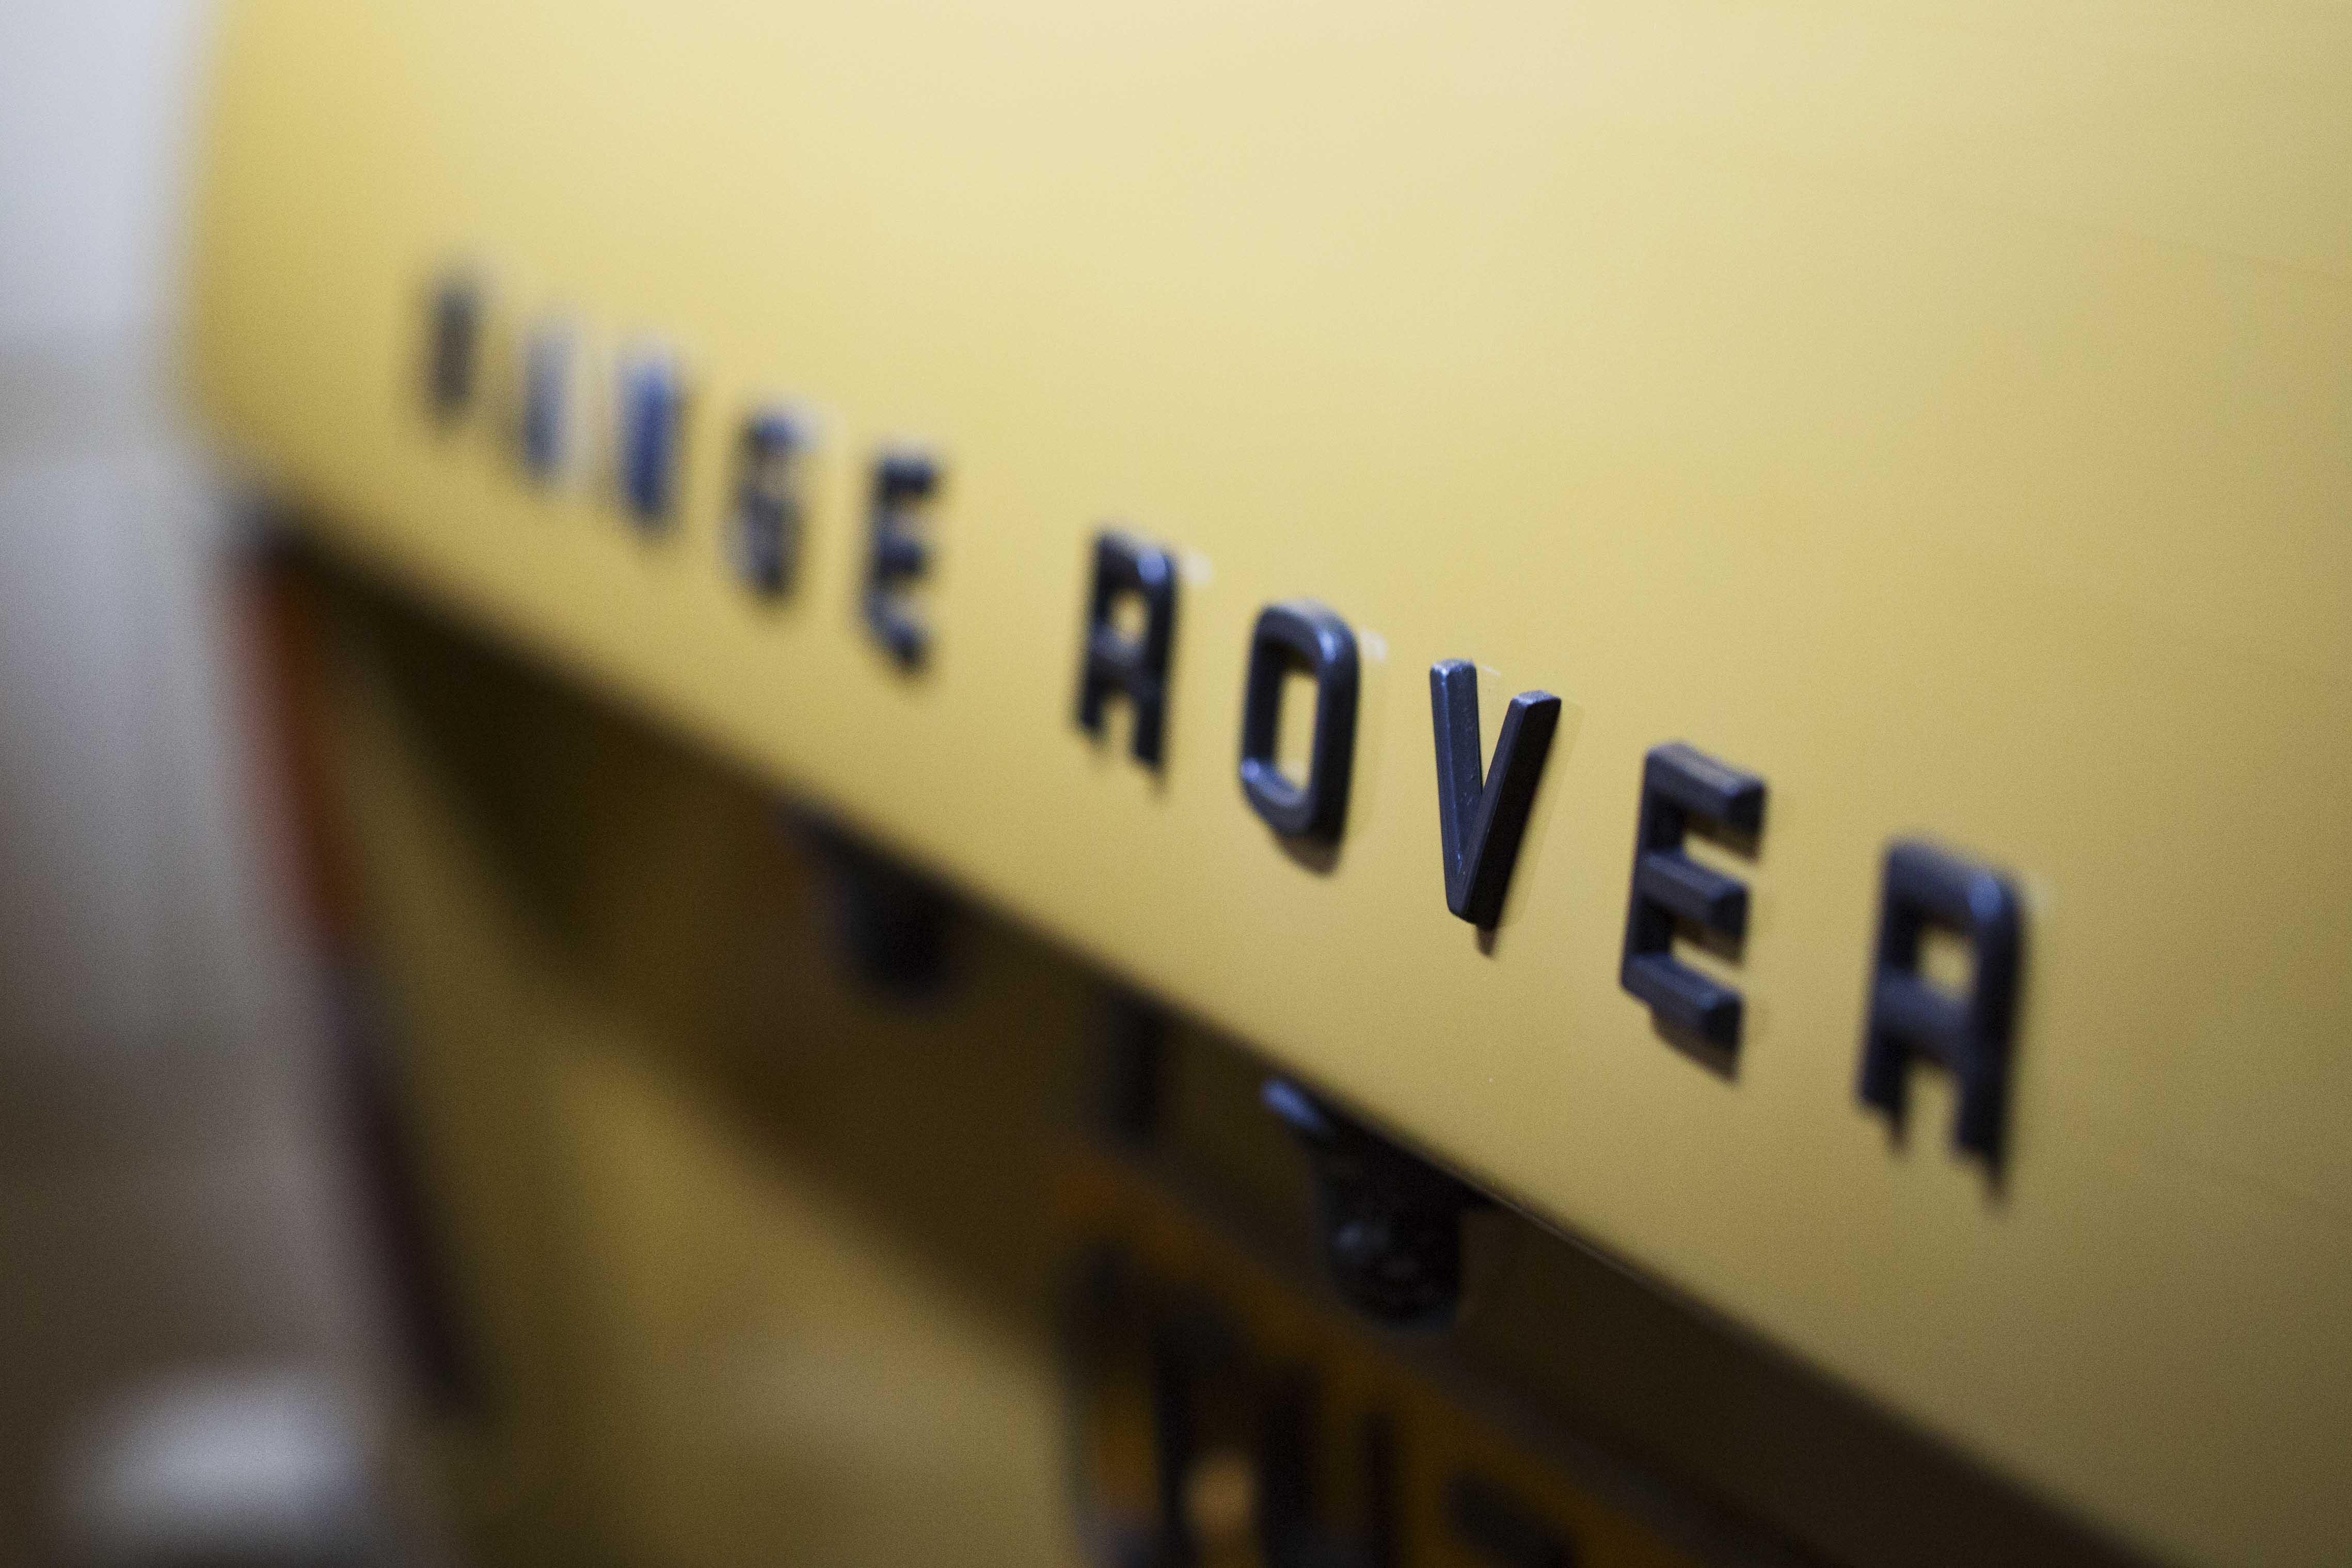 range-rover-suff-b-10